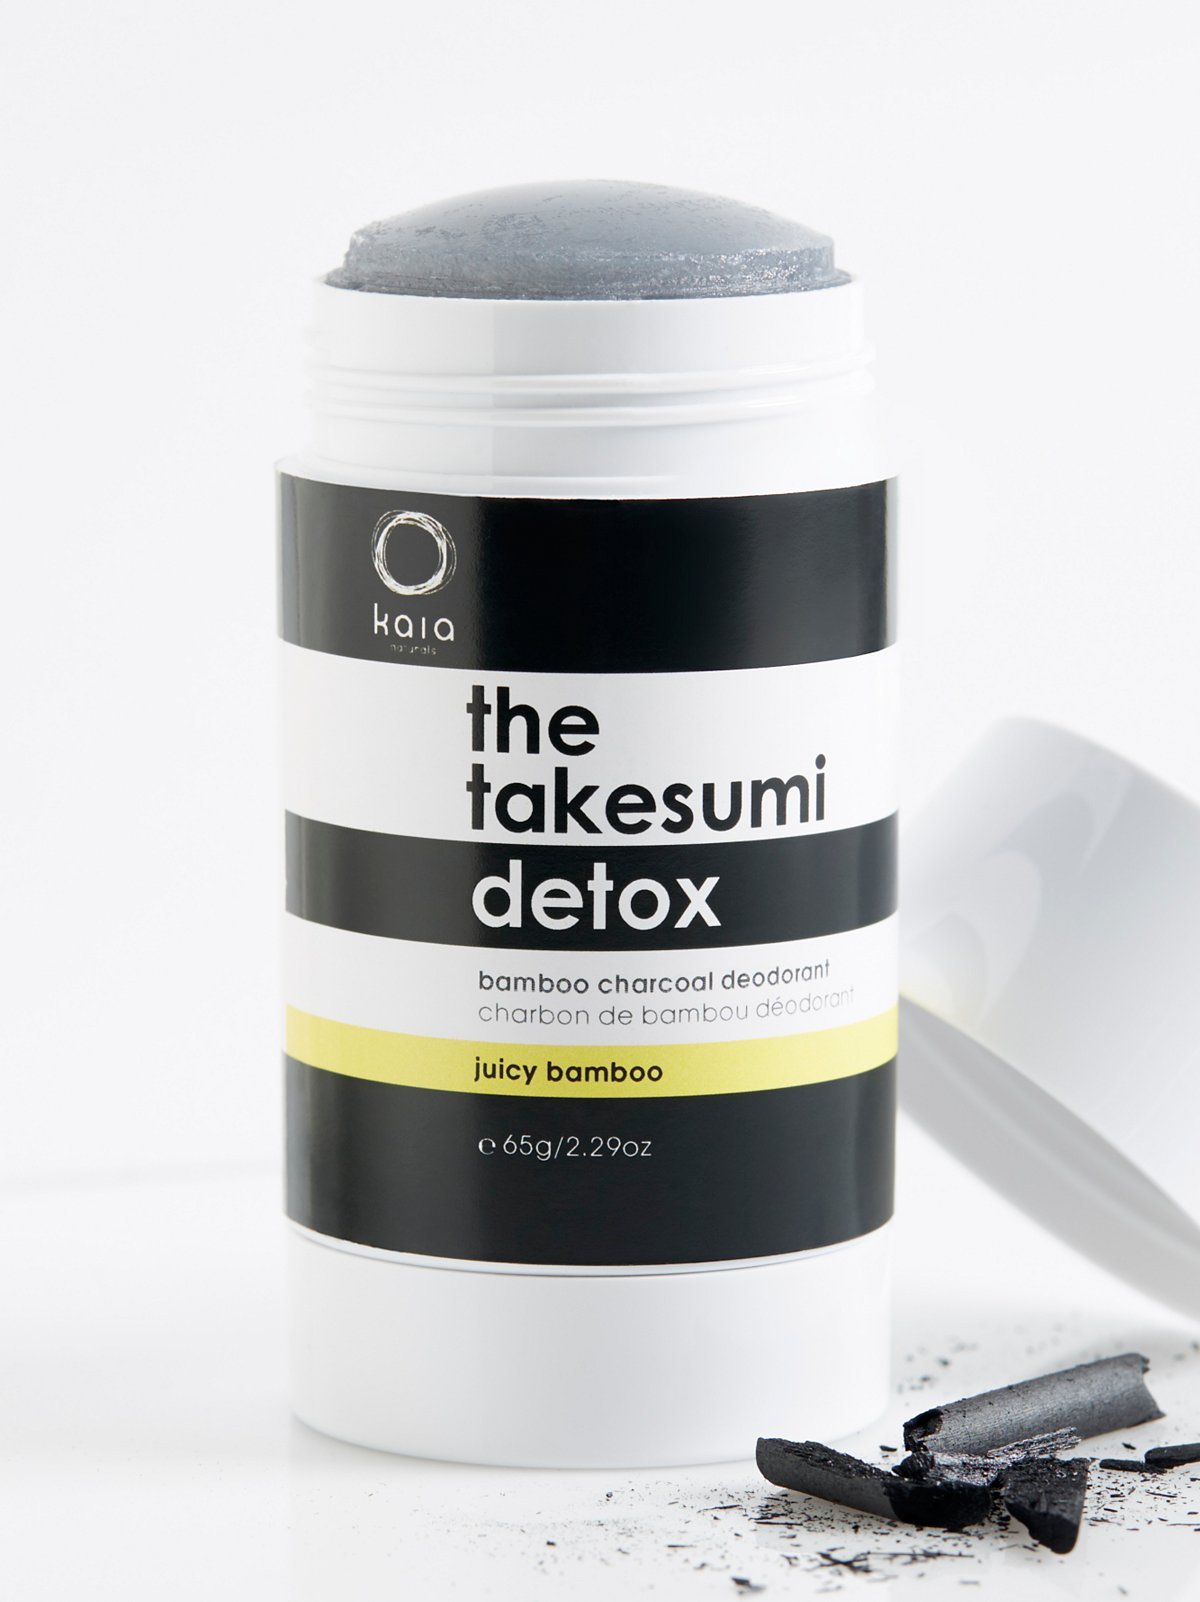 Takesumi排毒香体剂